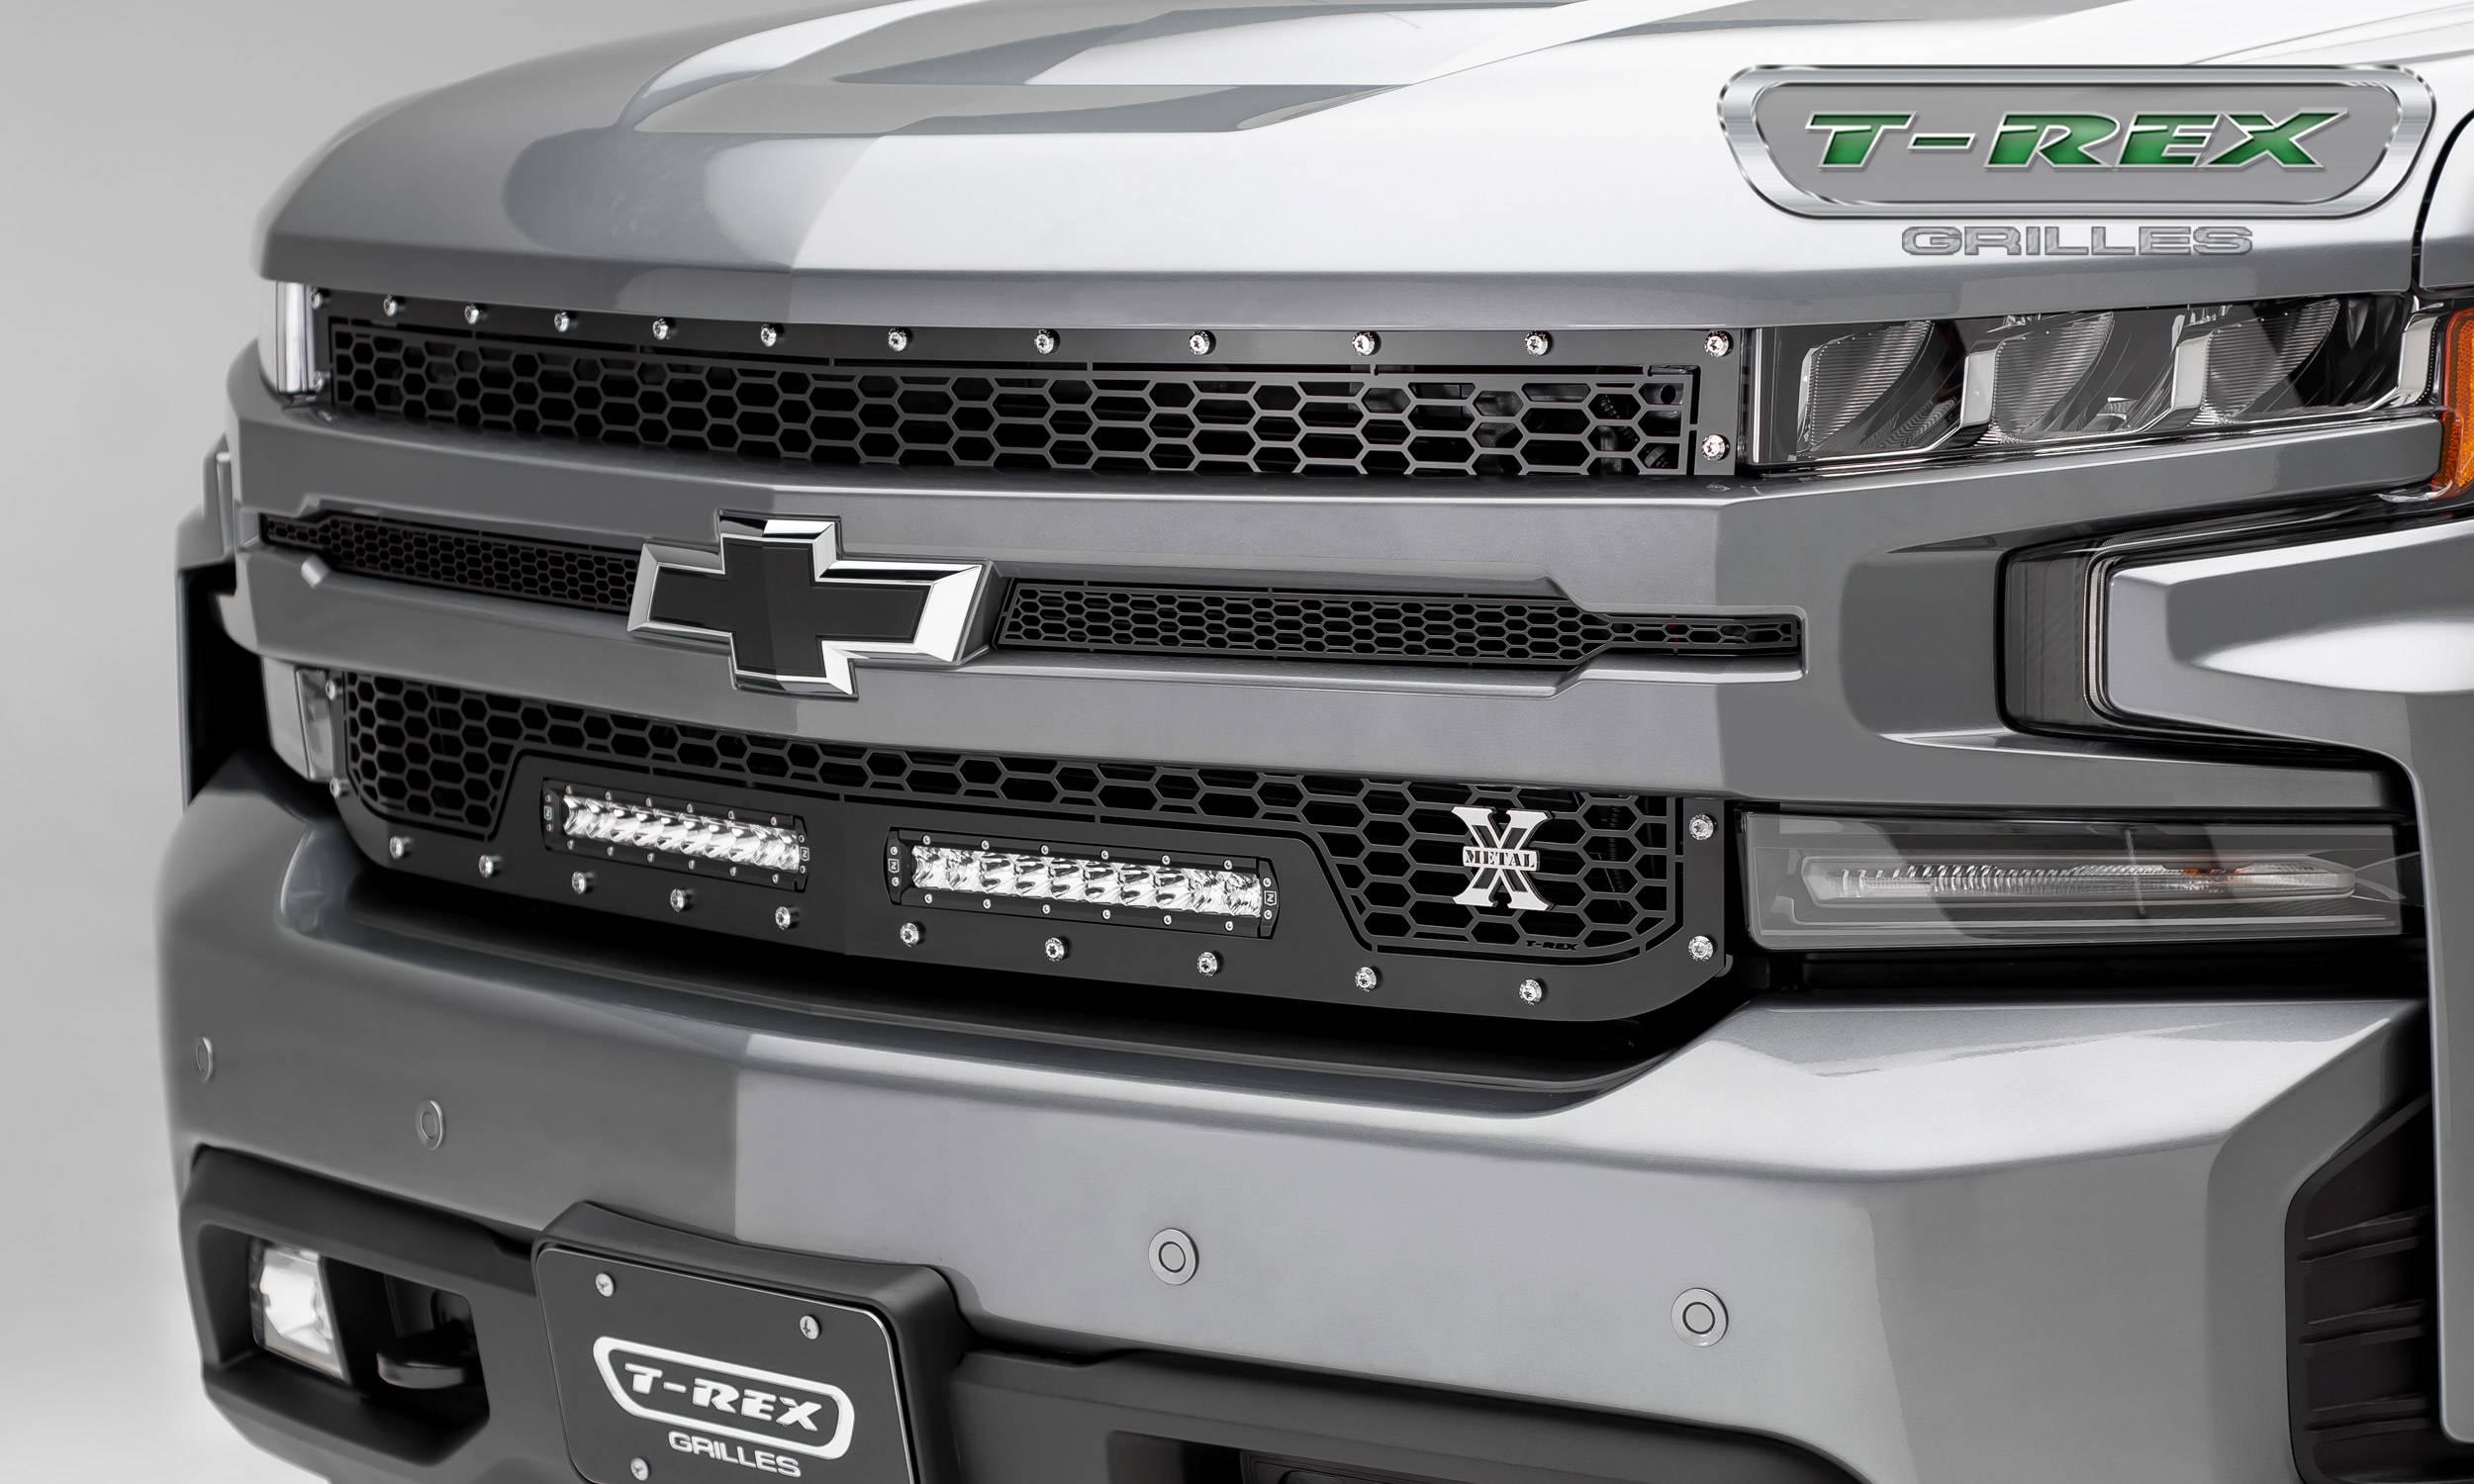 Chevrolet Silverado 1500 2019 Laser Torch Grille, Black, Mild Steel, 1 Pc, Replacement - Pt #7311261